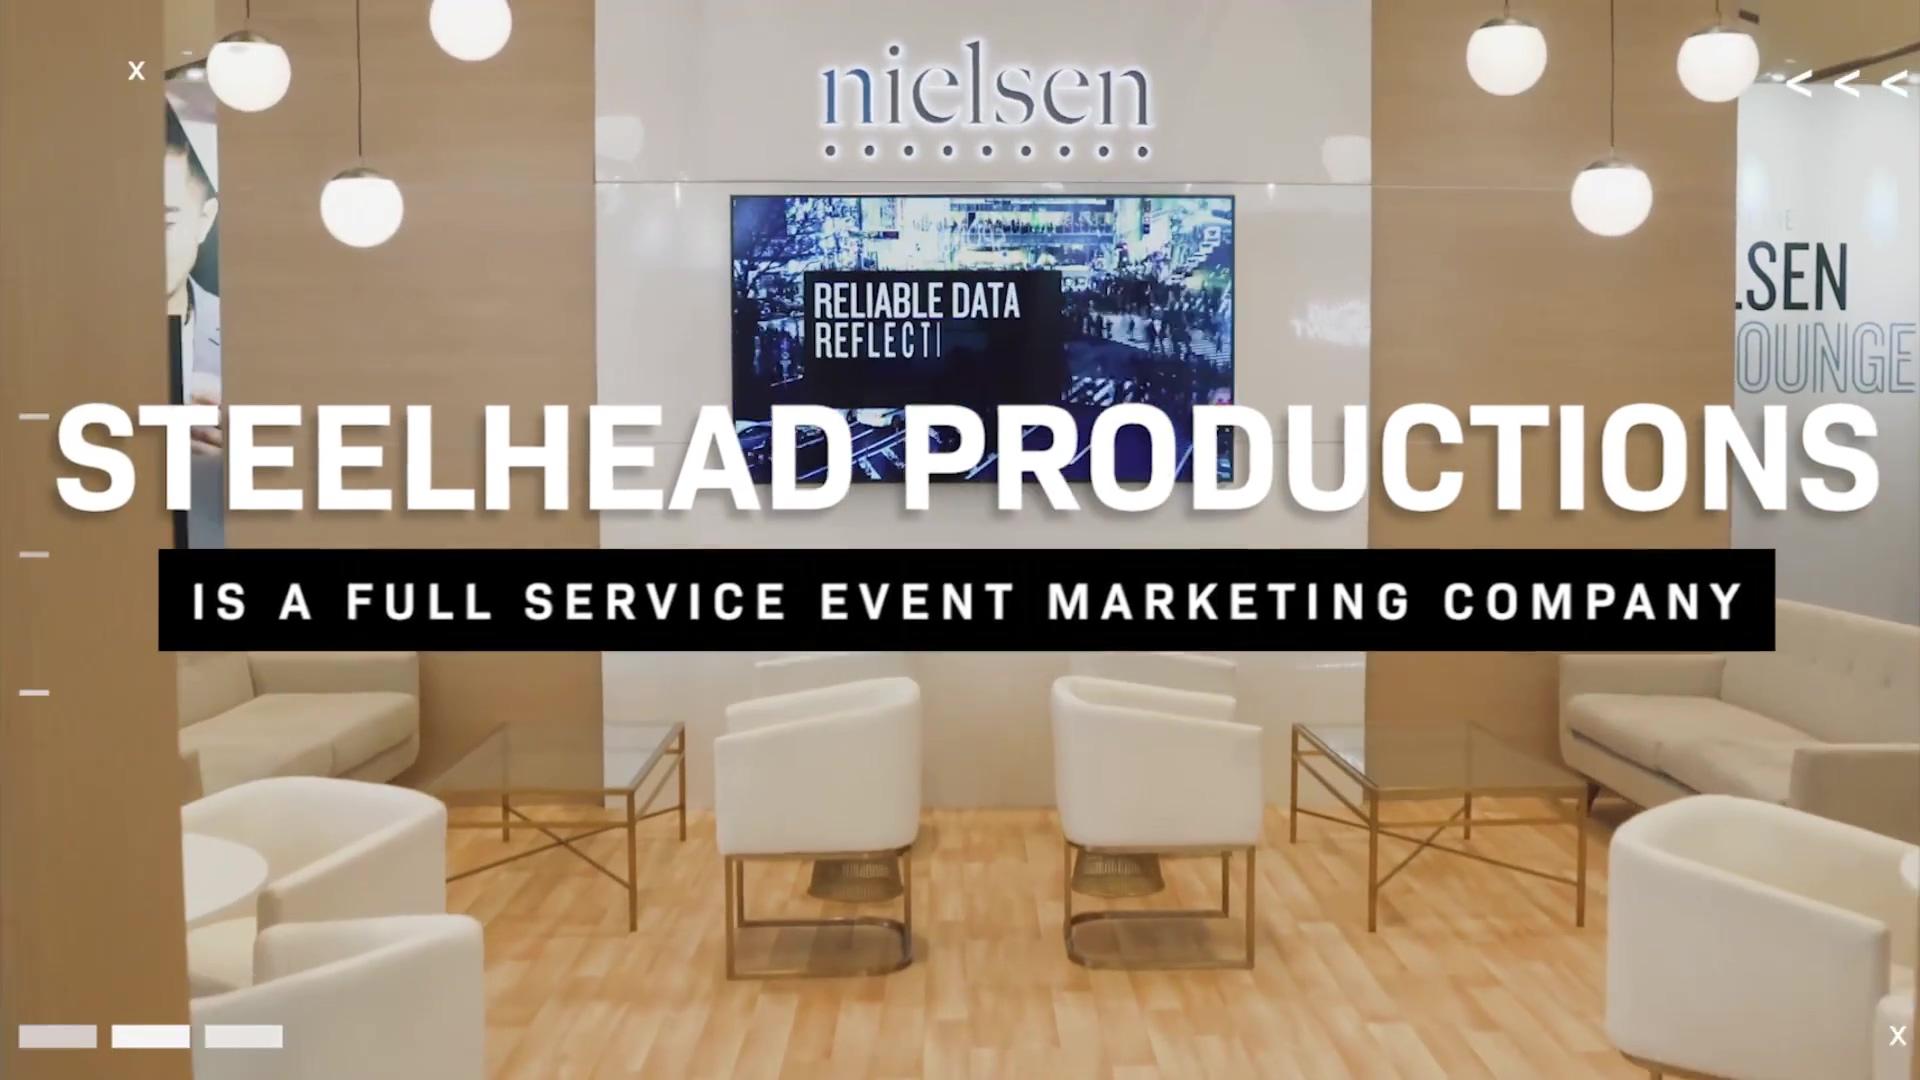 Steelhead Commercial - 40 sec